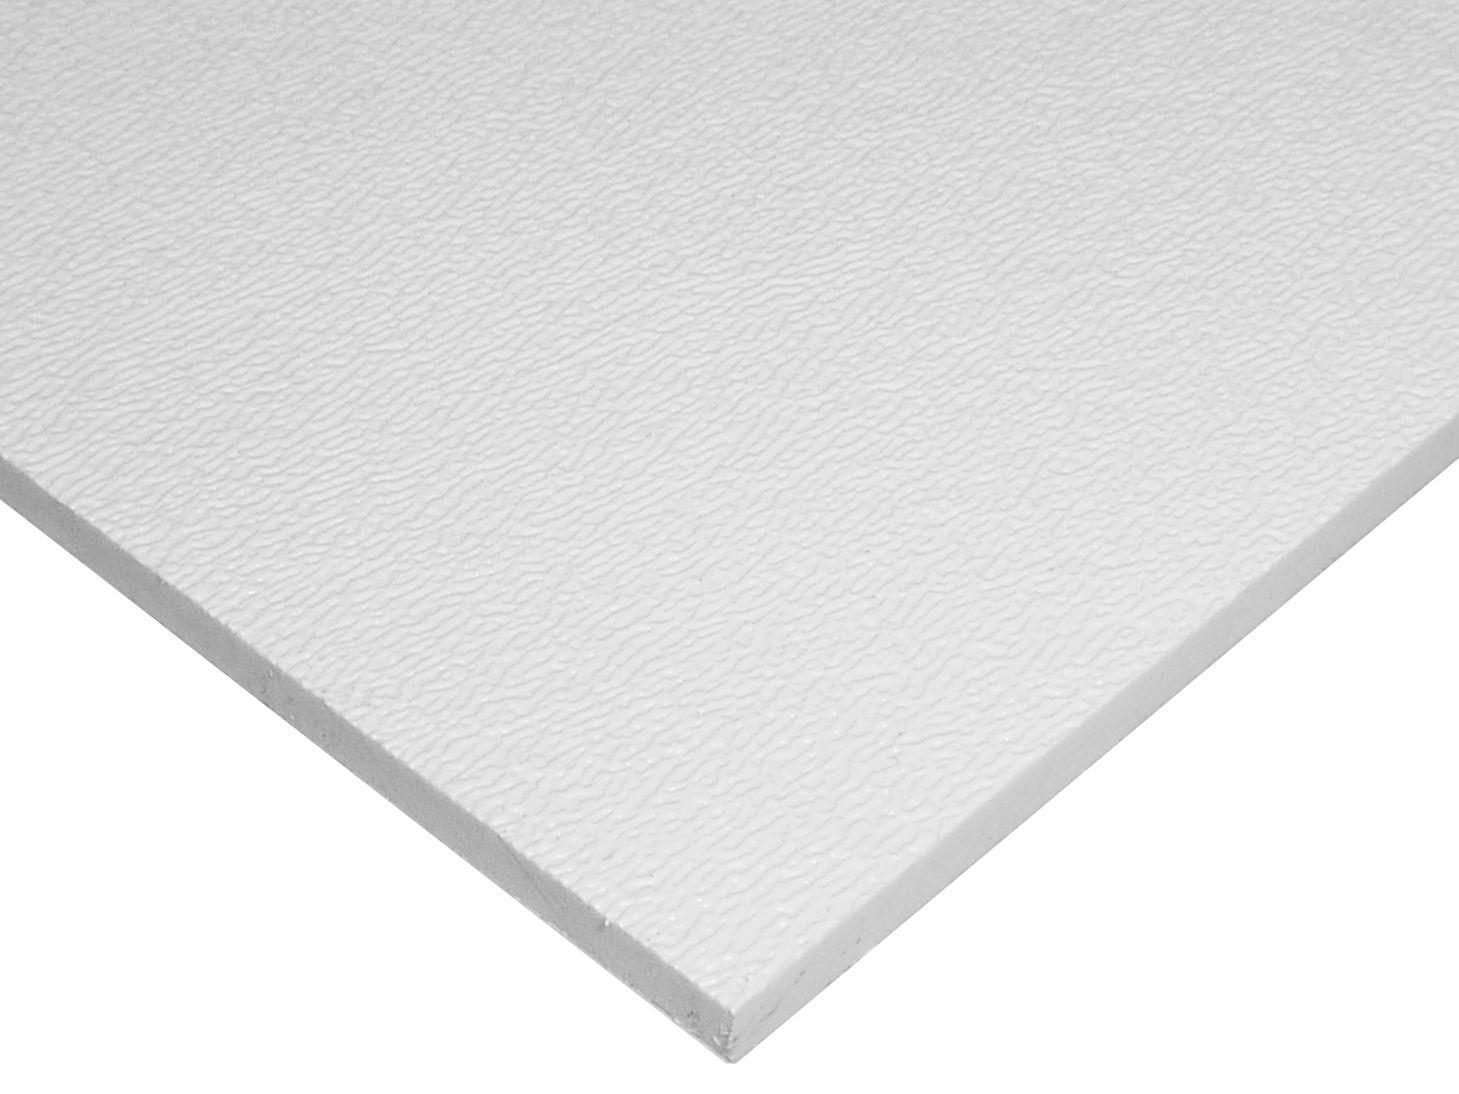 Abs Sheet Natural Machine Grade Extrude Sheet Plastic Sheets